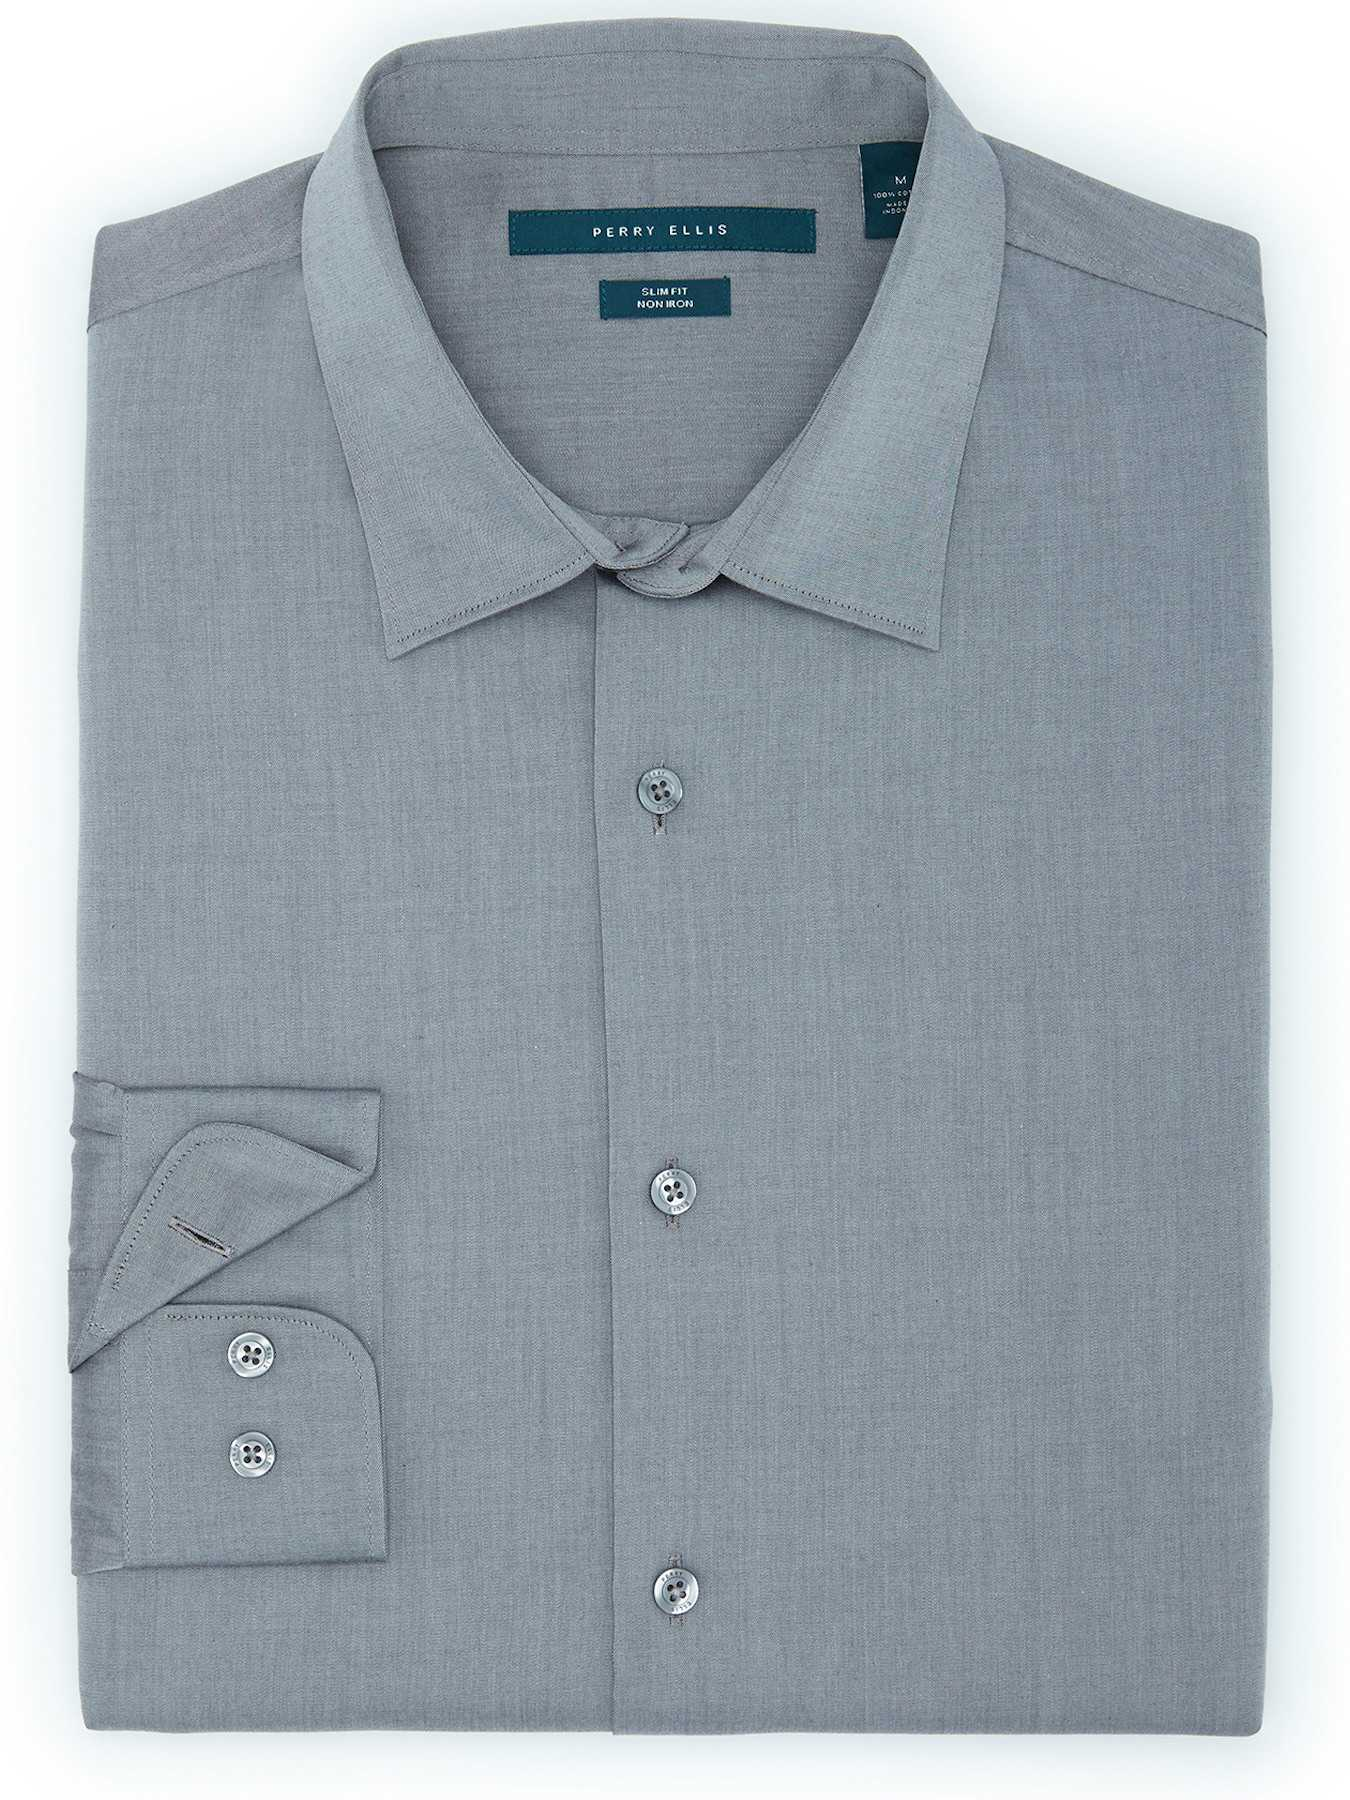 Perry Ellis Non-Iron Slim Fit Essential Shirt